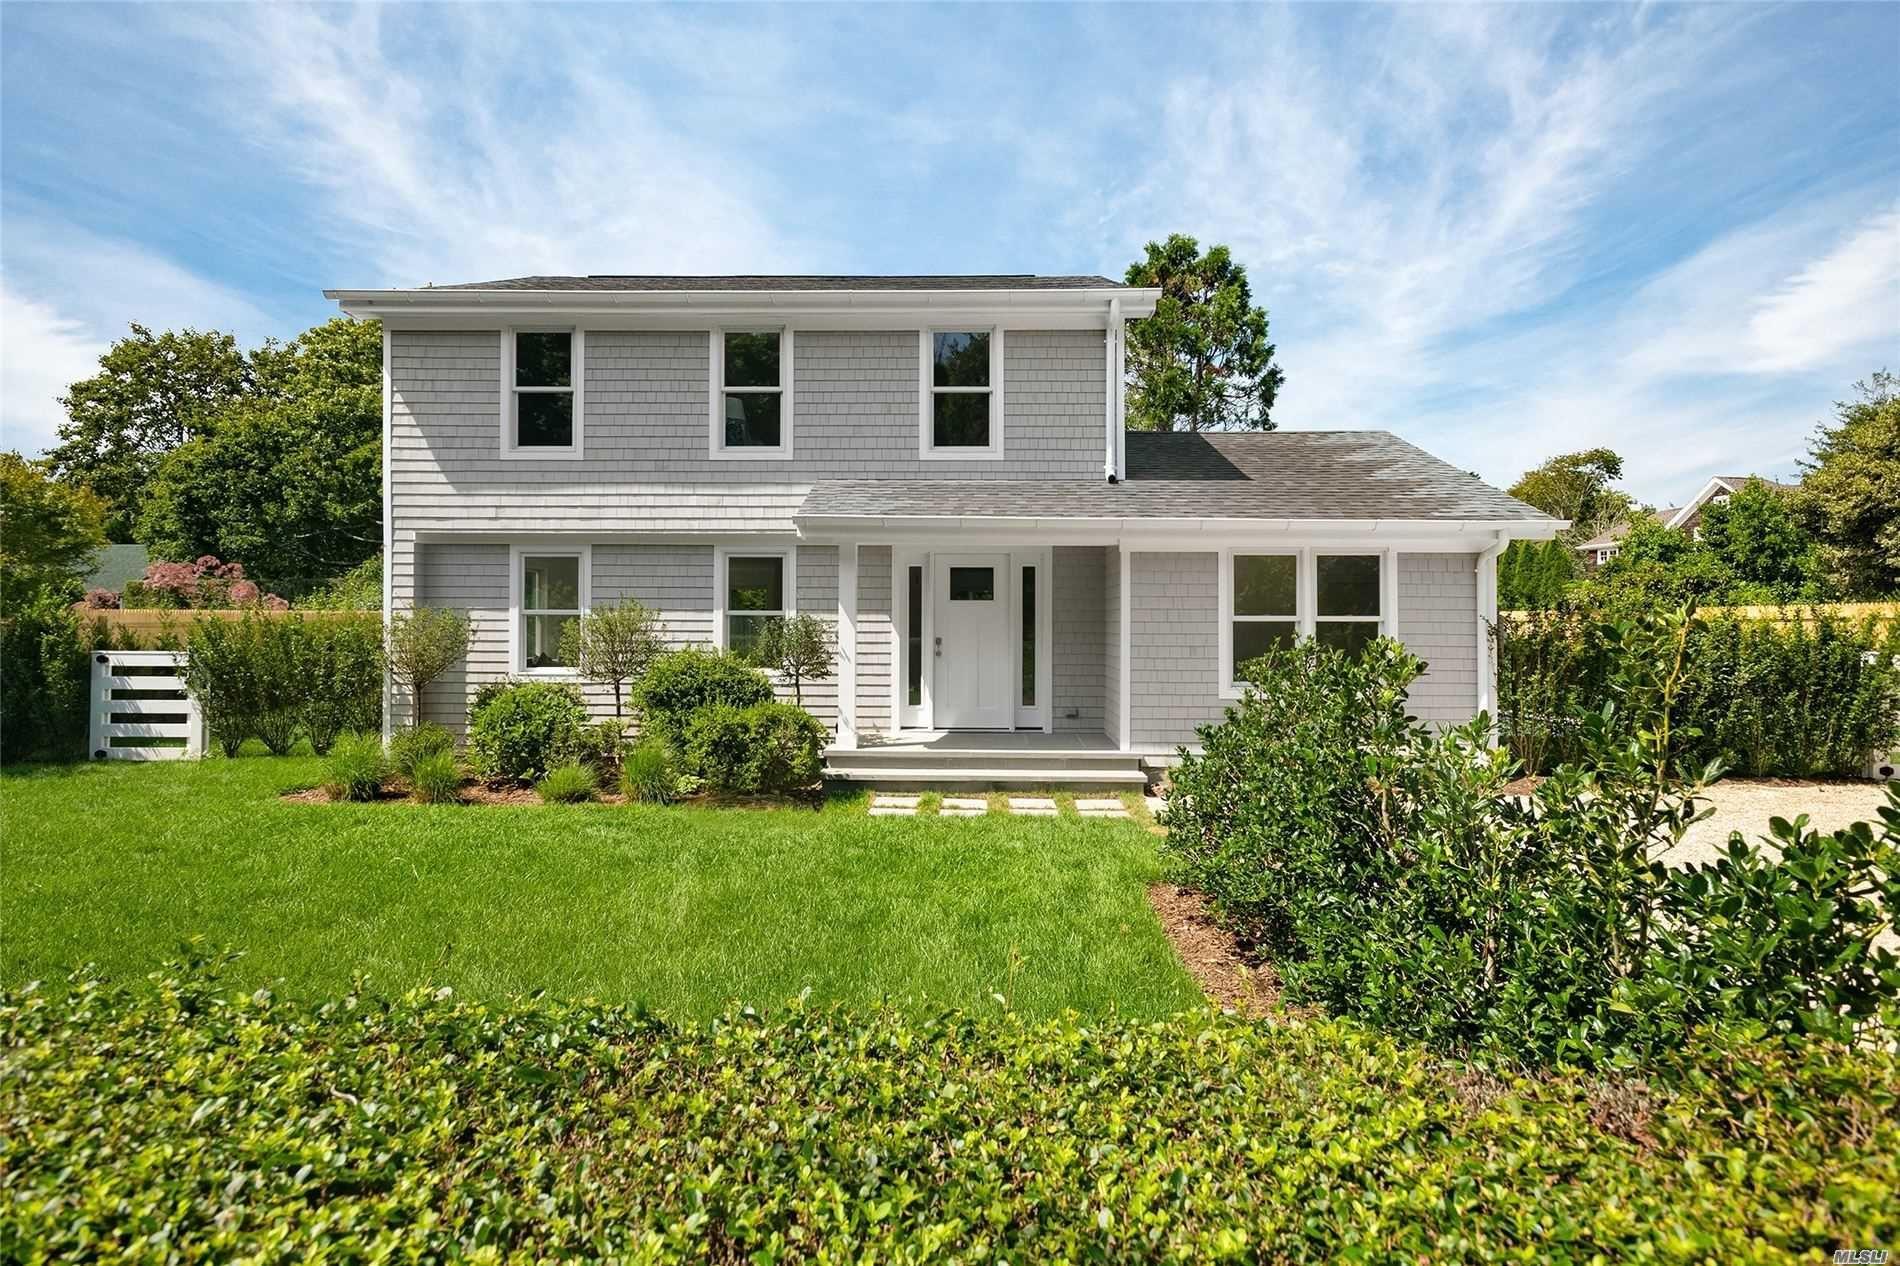 152 Pelletreau Street, Southampton, NY 11968 - MLS#: 3238493